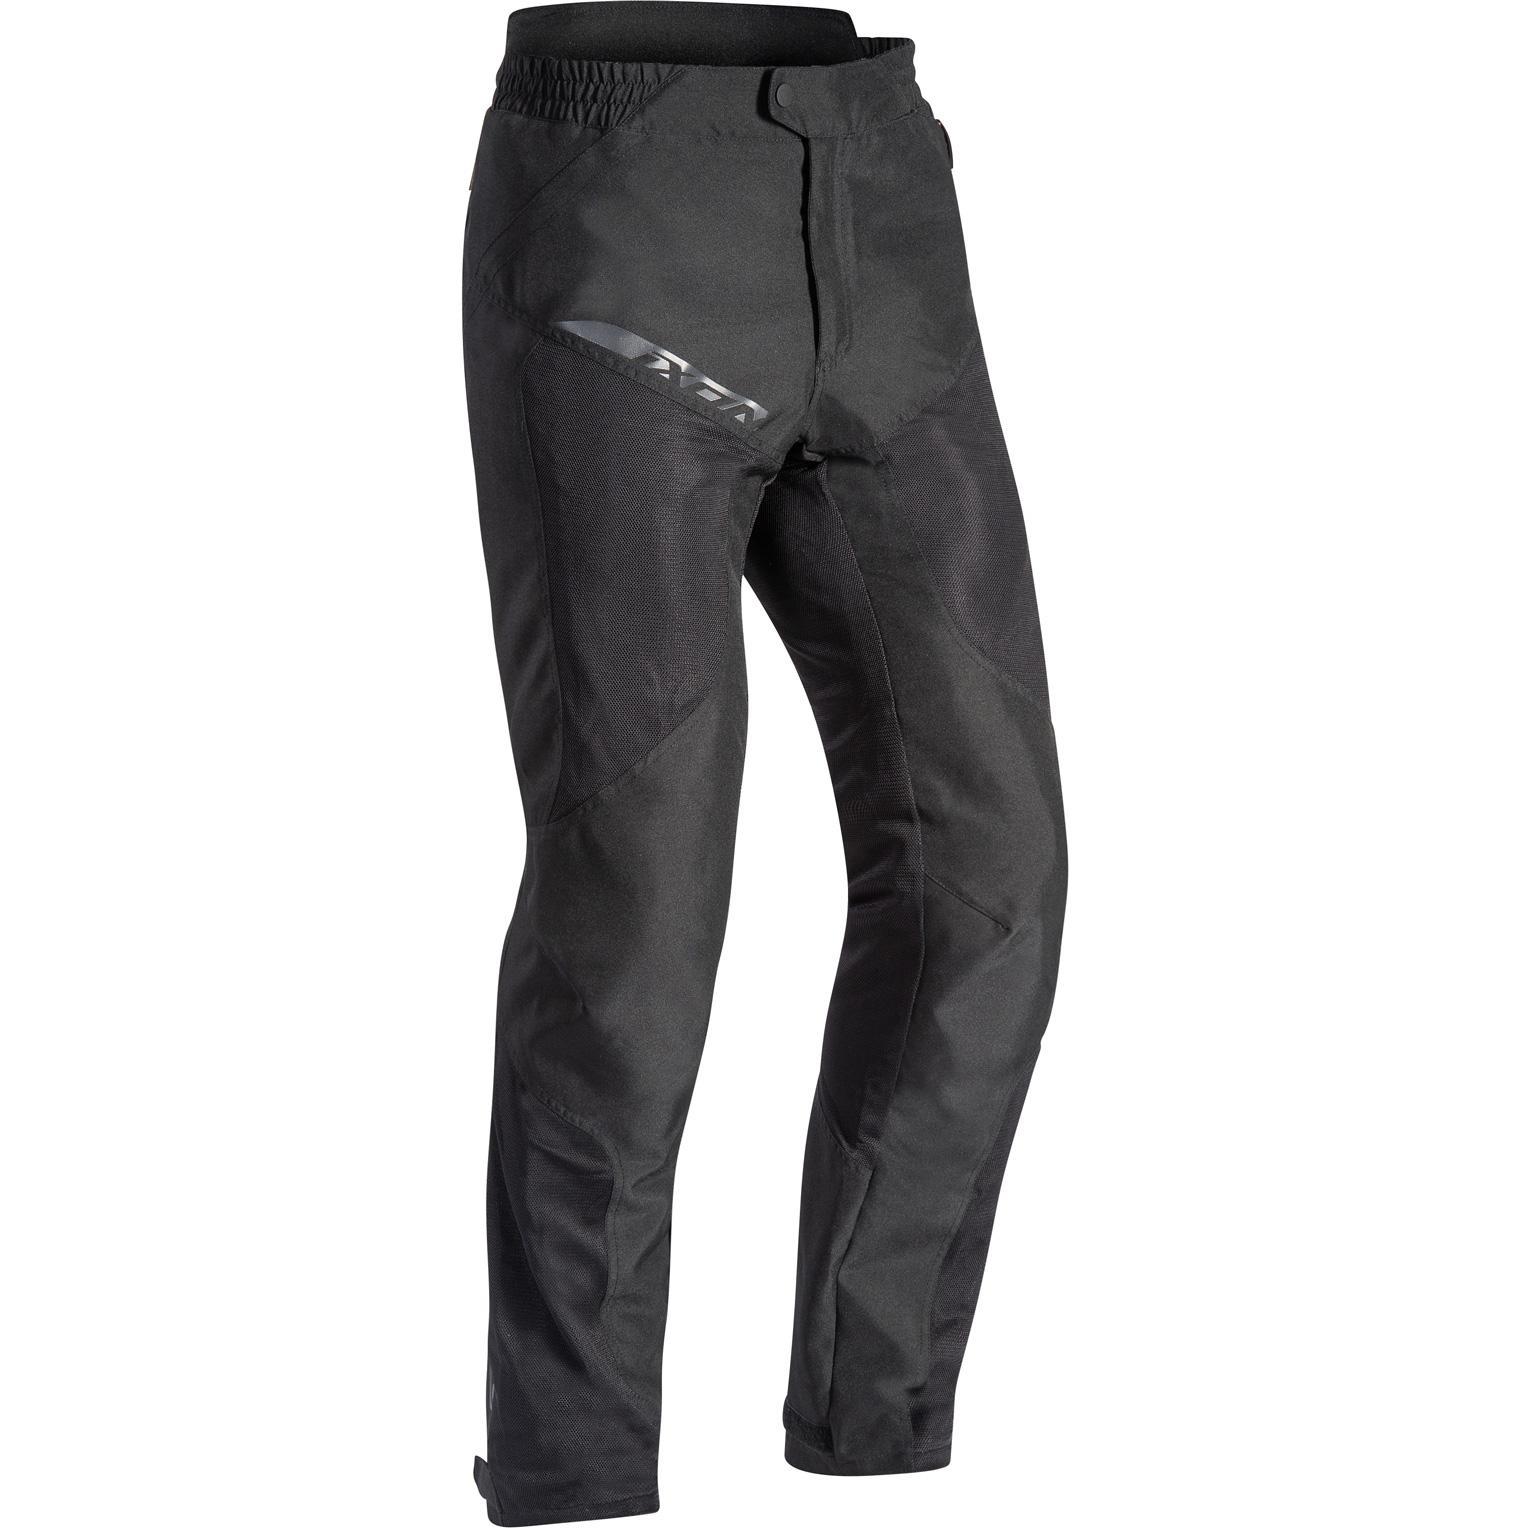 IXON-Pantalon Cool Air Pt